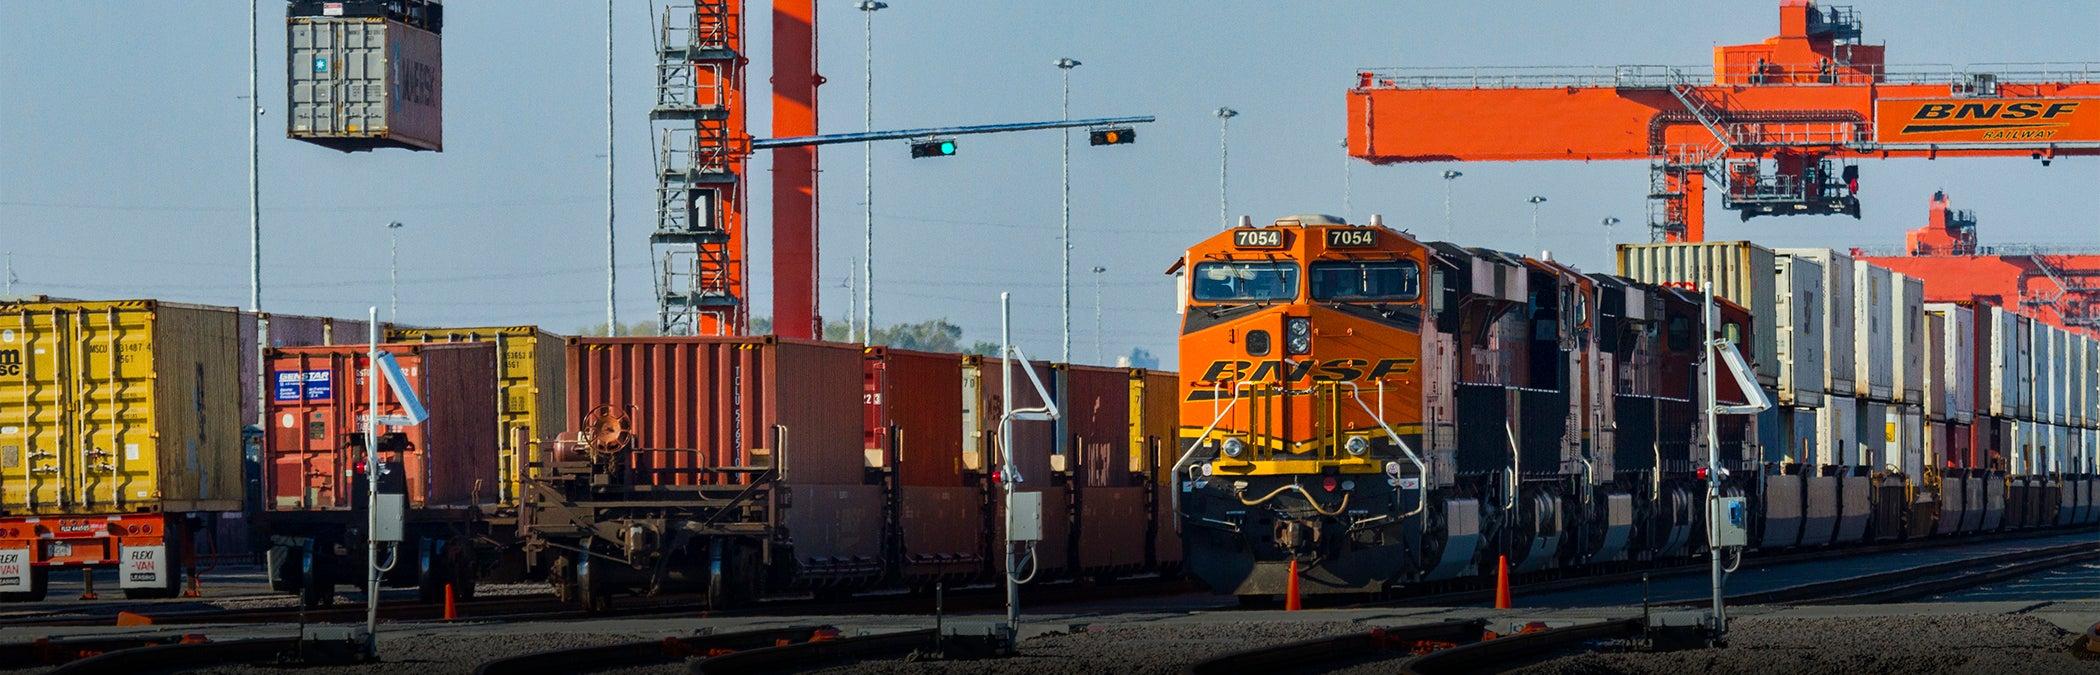 Bnsf Logistics Park Kansas City Hdr